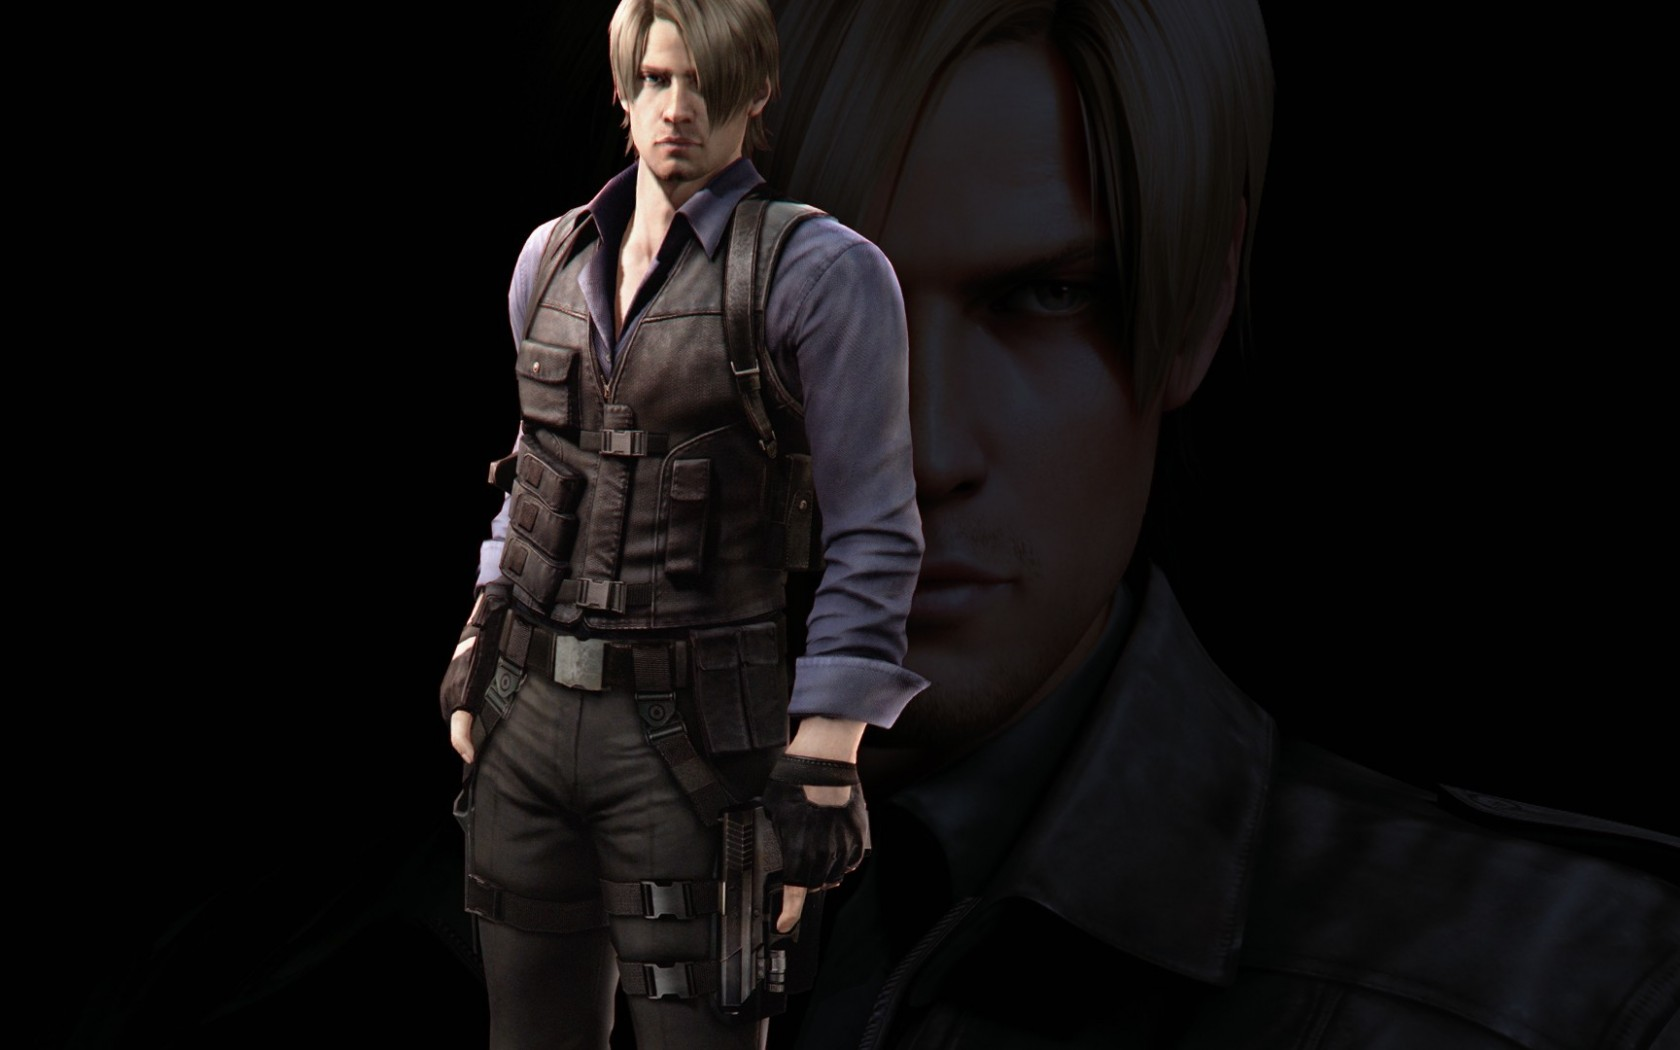 99 Leon Resident Evil 6 Wallpapers On Wallpapersafari